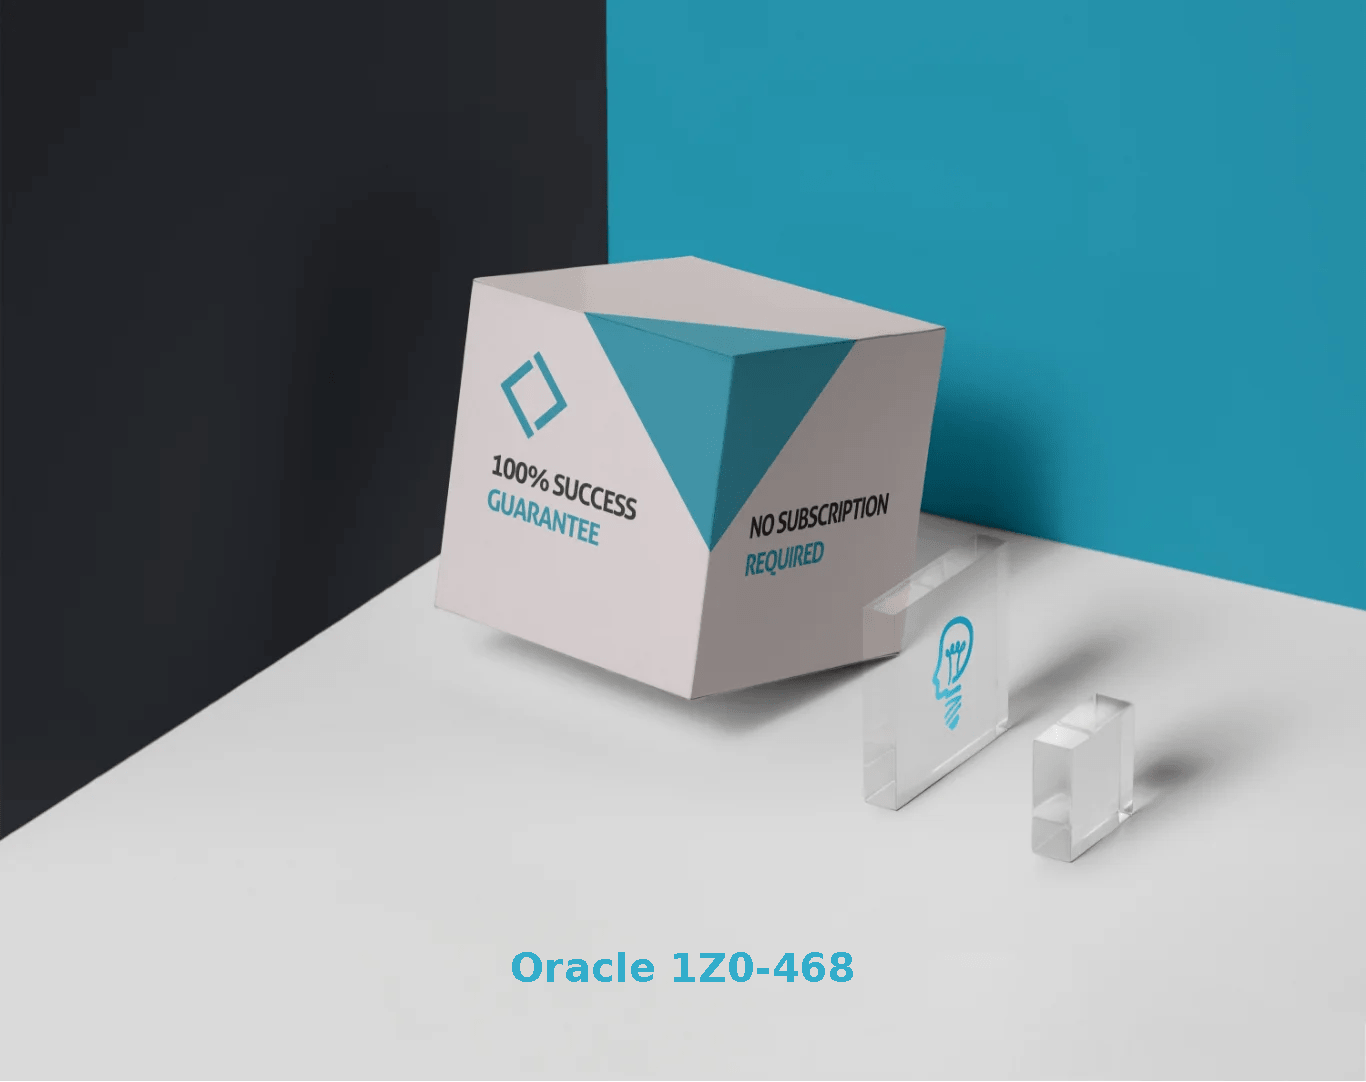 Oracle 1Z0-468 Exams